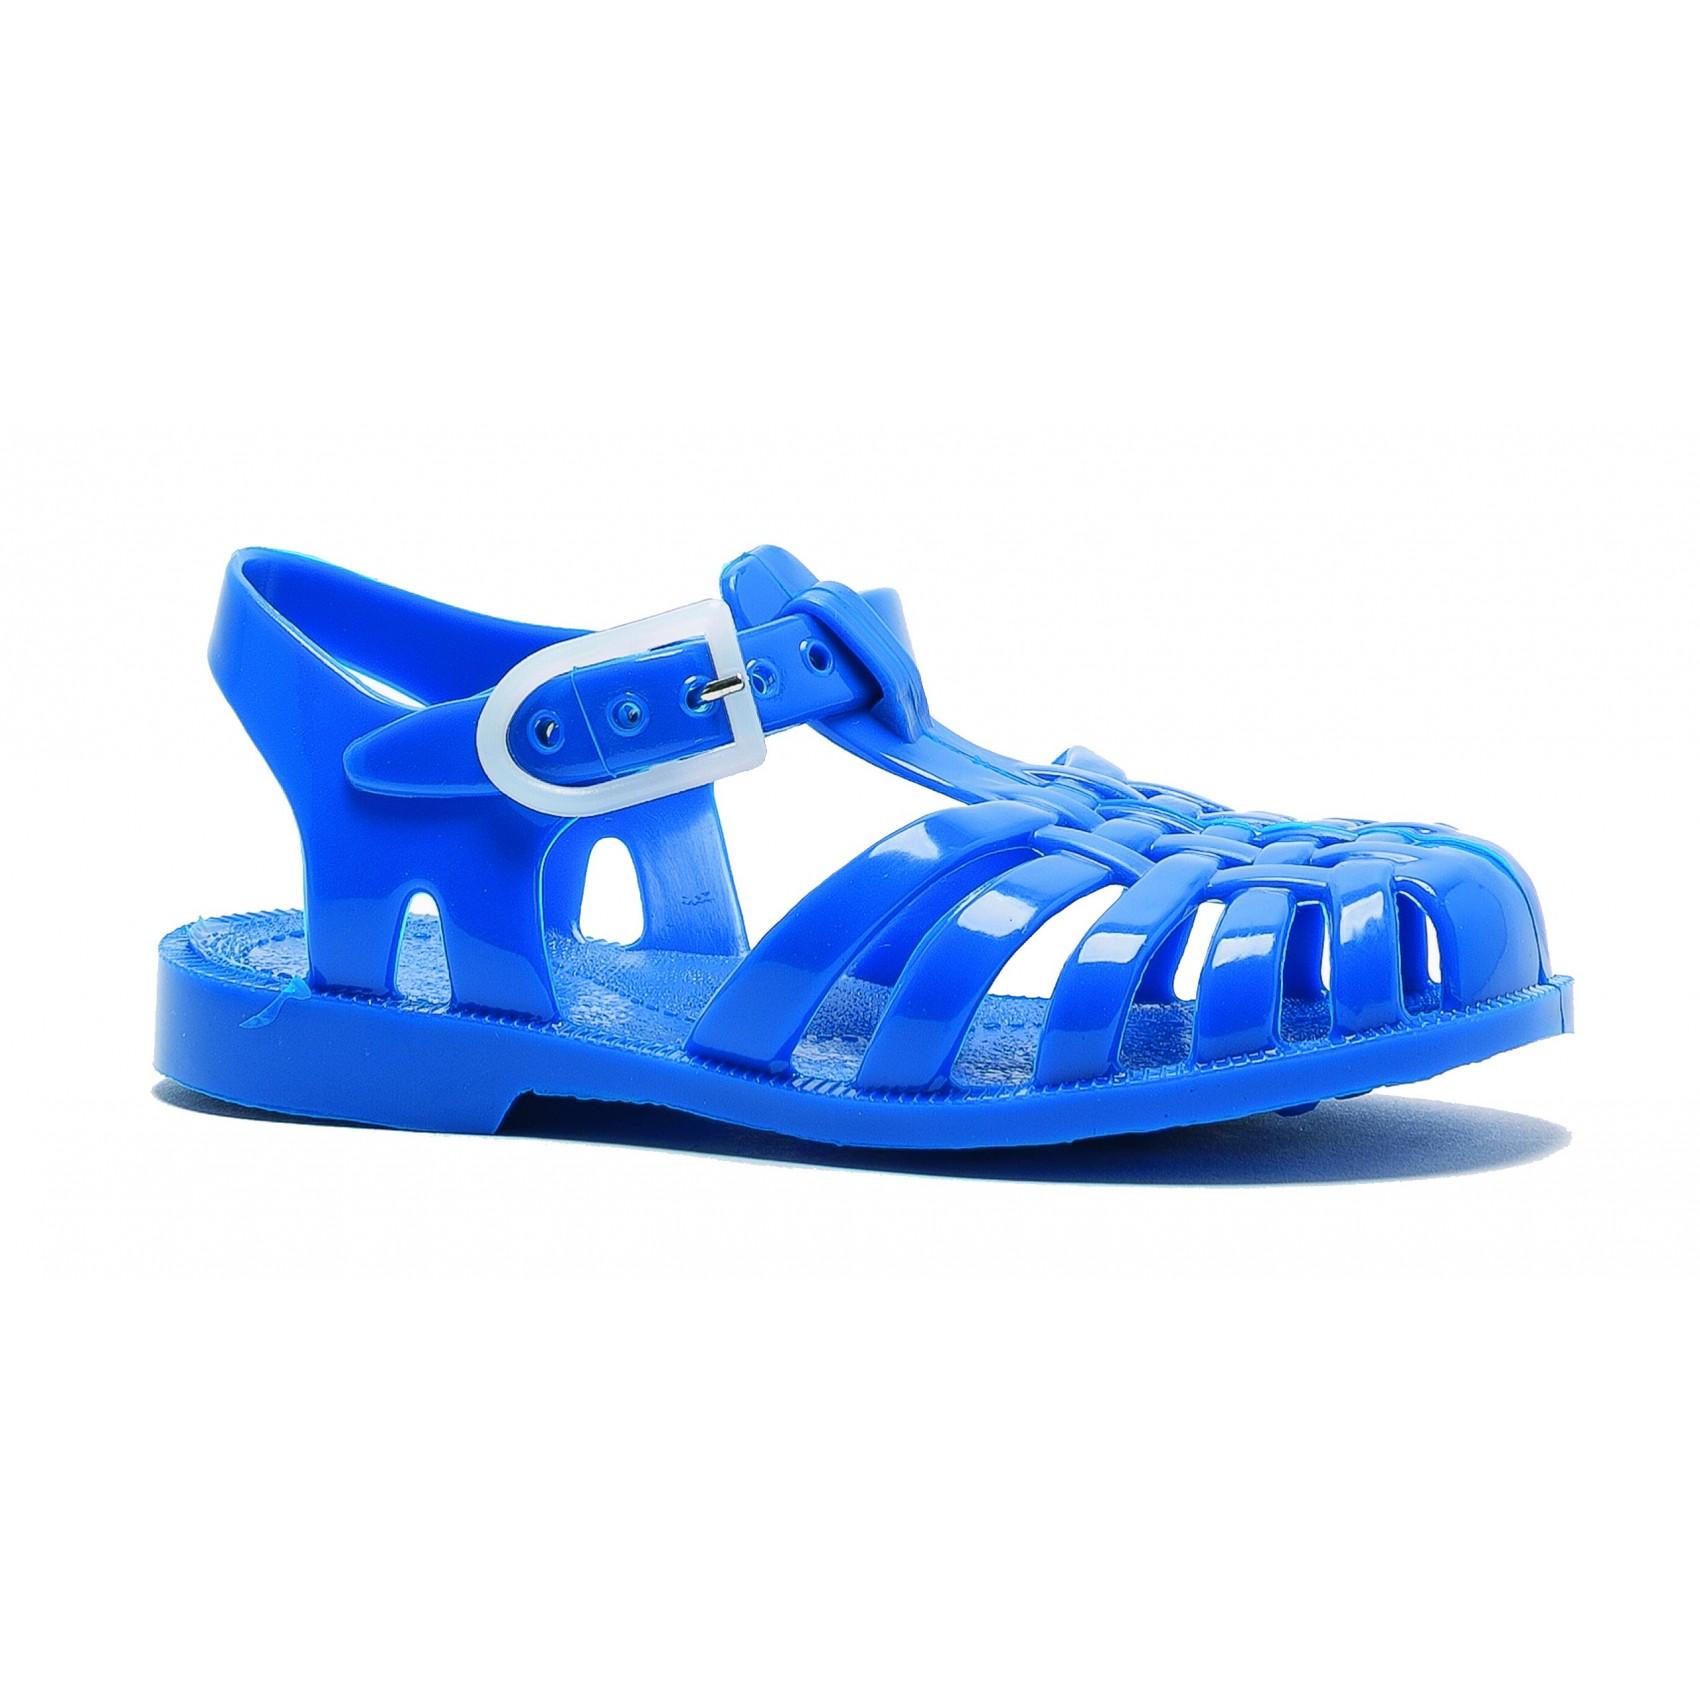 sandales enfant en plastique bleu roy m duse chez. Black Bedroom Furniture Sets. Home Design Ideas